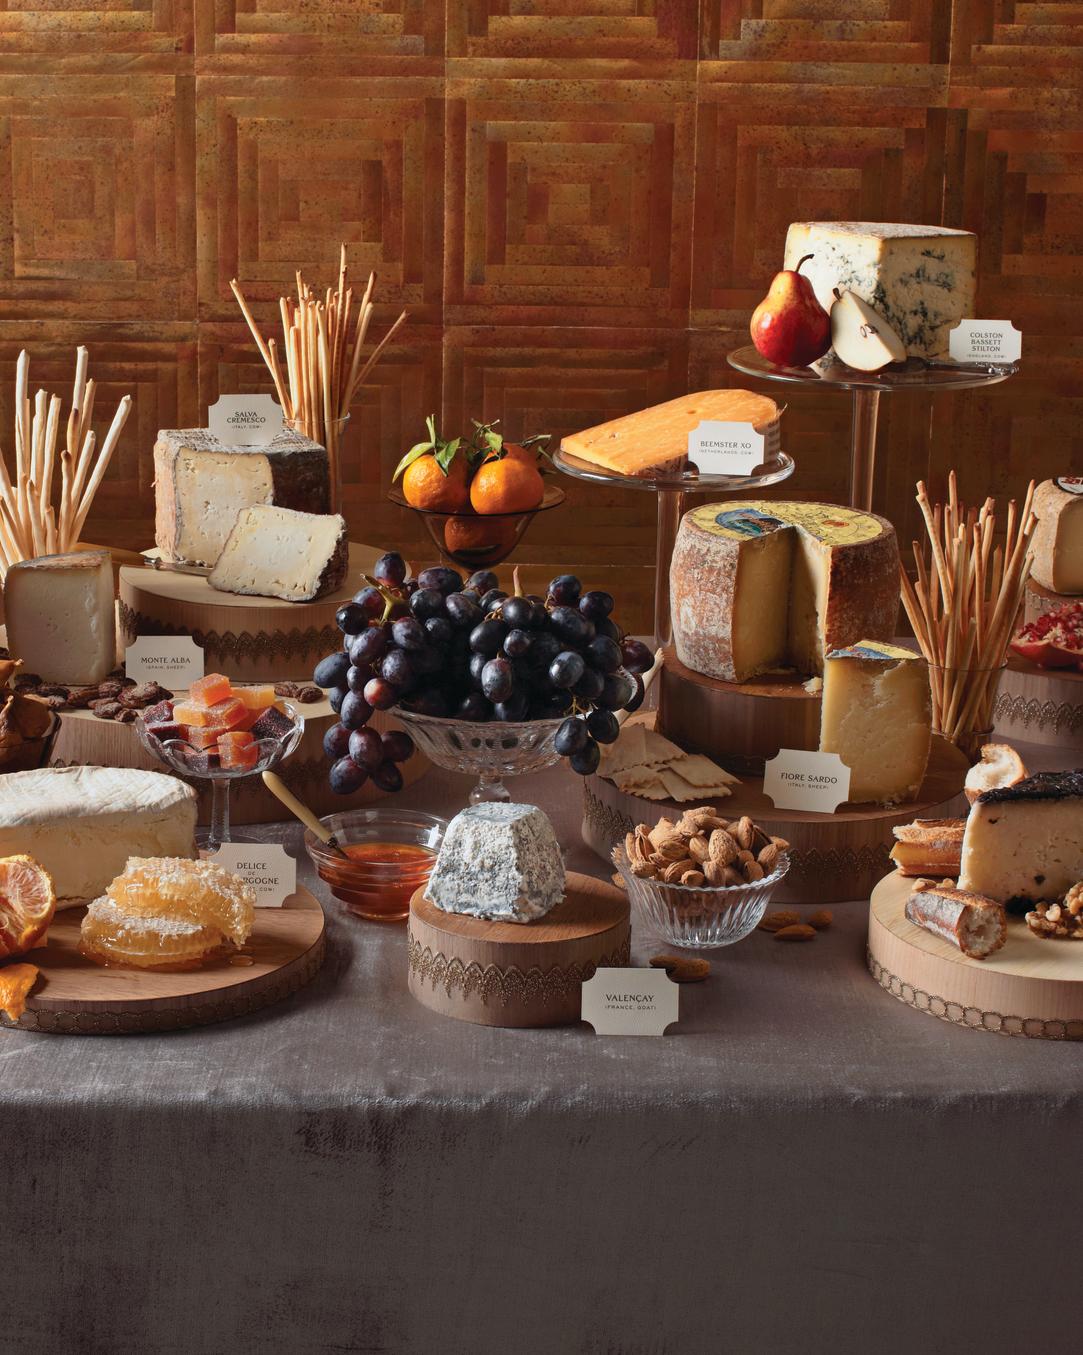 cheese-display-md108850.jpg